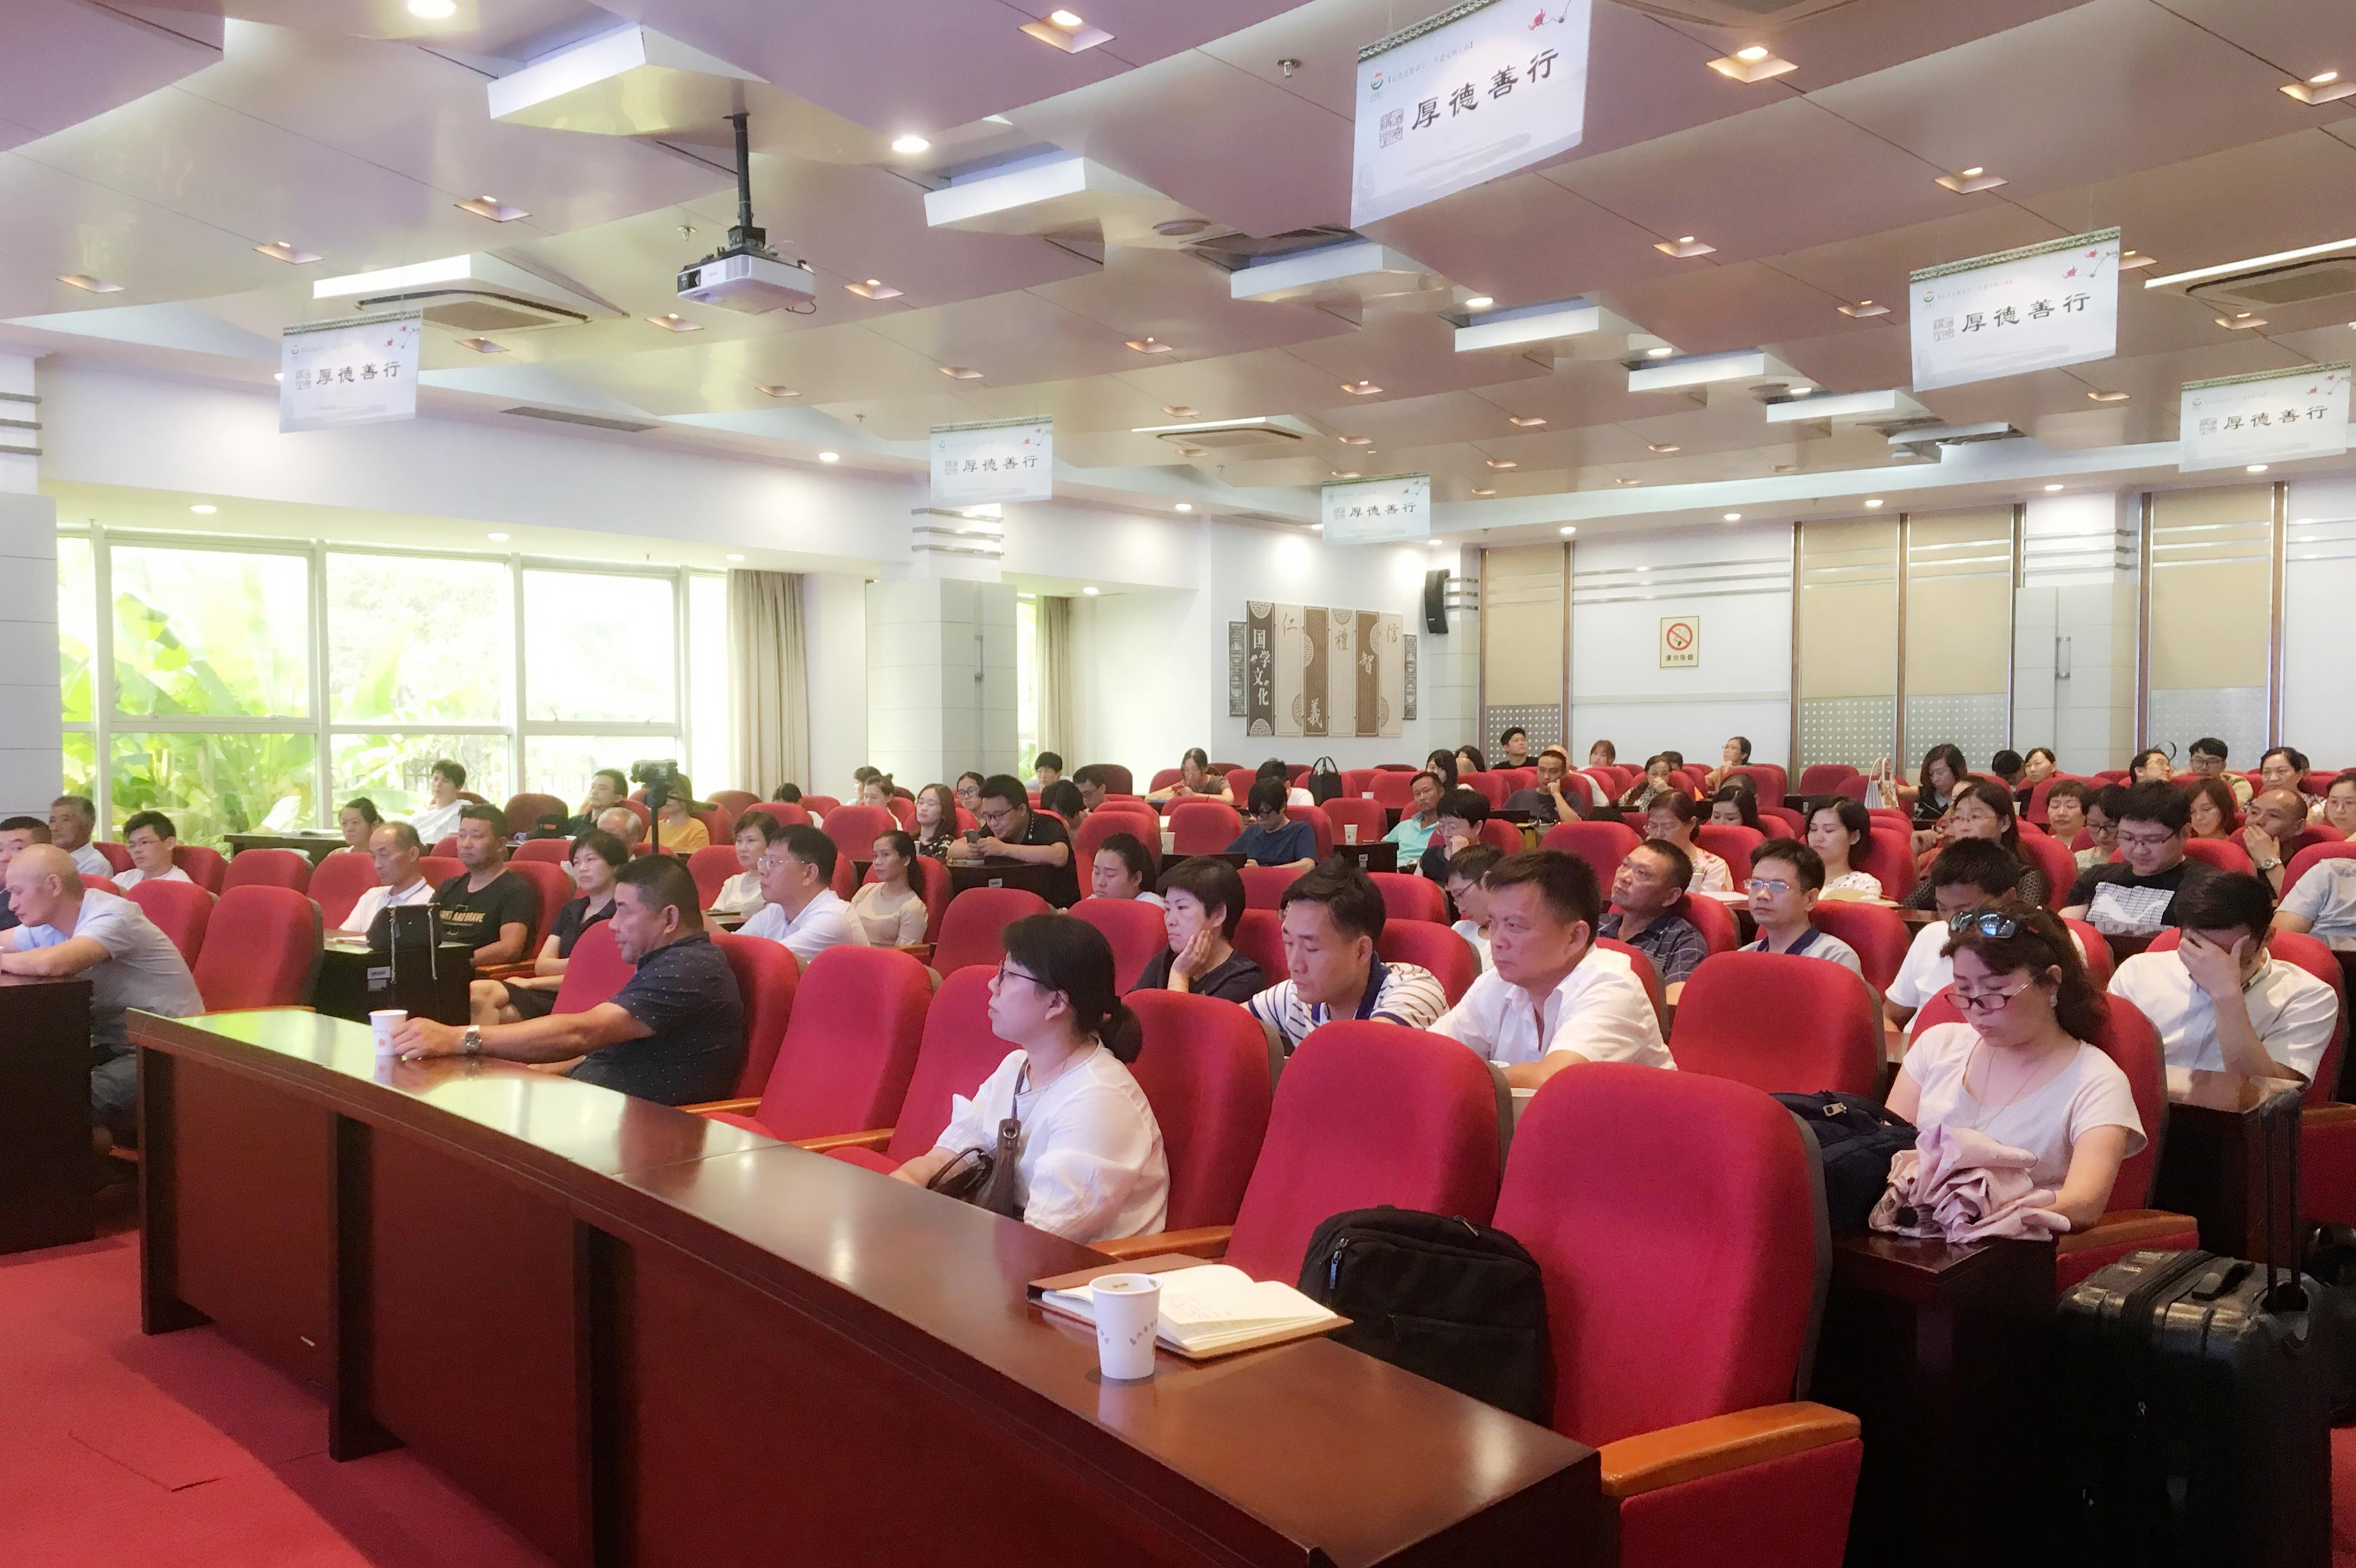 http://lpsp-cms-temp.oss-cn-shanghai.aliyuncs.com/24FE516CE3924B3D882E1AEB80779934